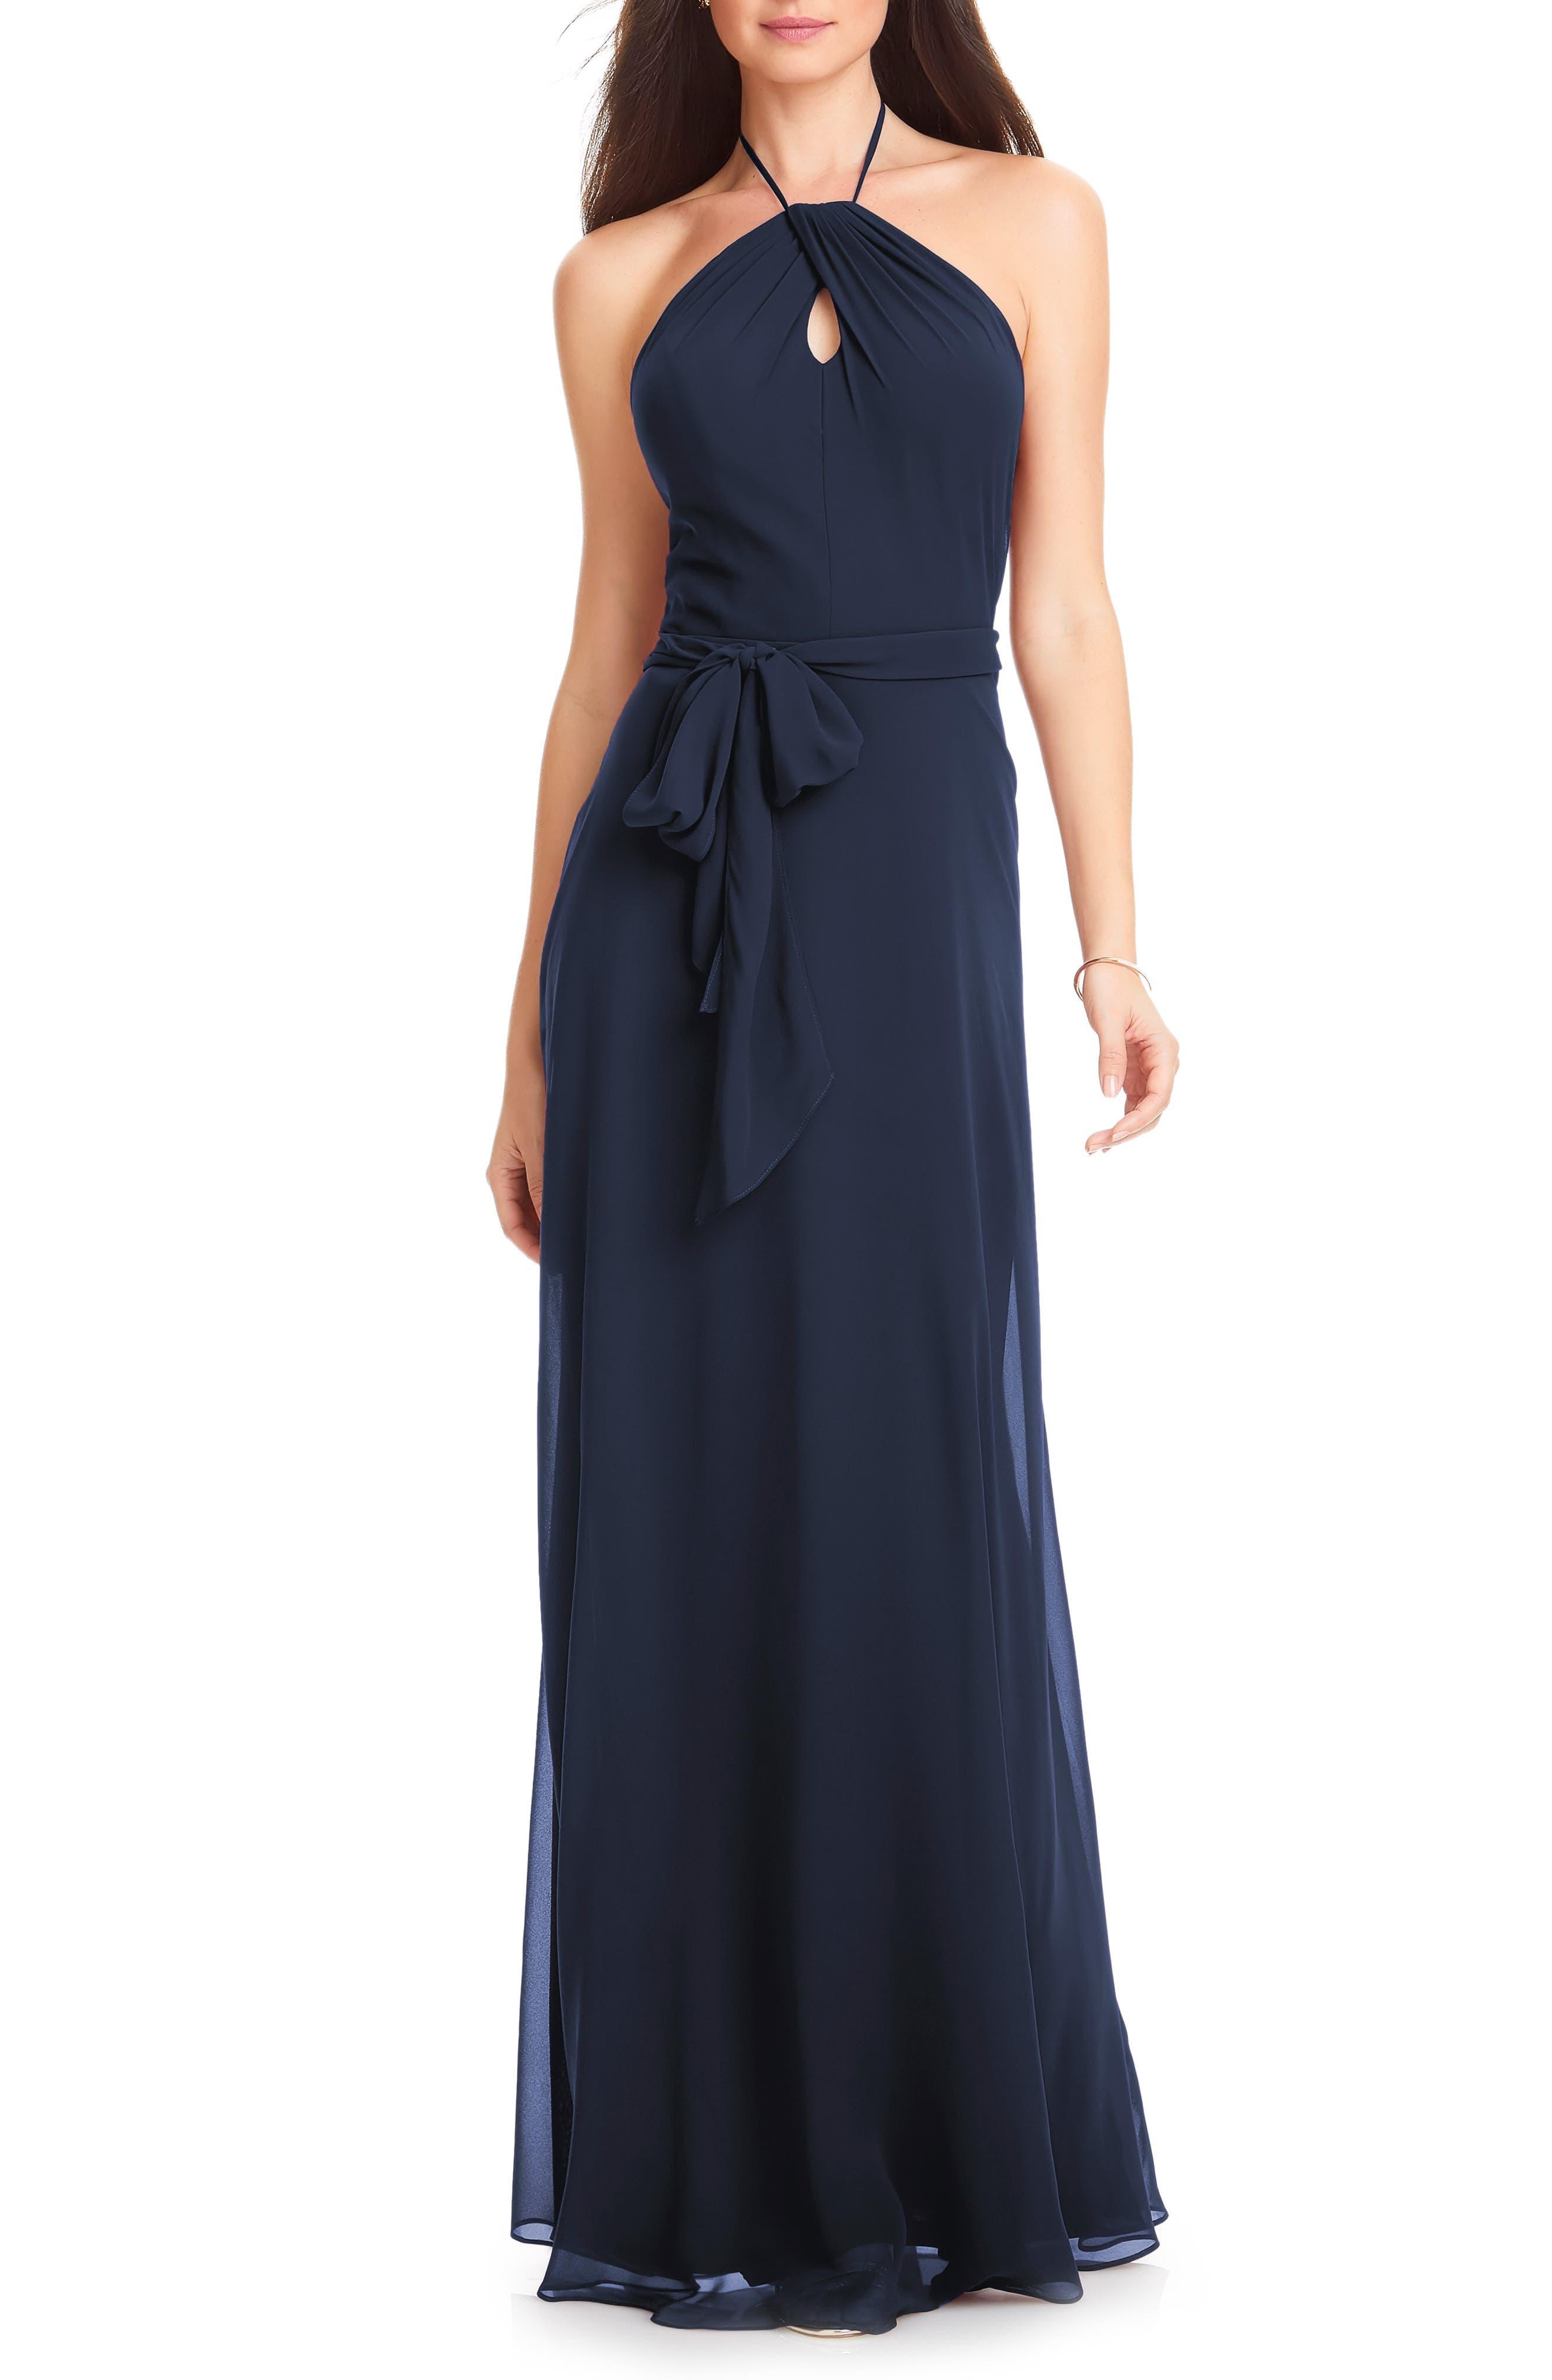 #LEVKOFF, Chiffon Tie Waist Halter Gown, Main thumbnail 1, color, NAVY